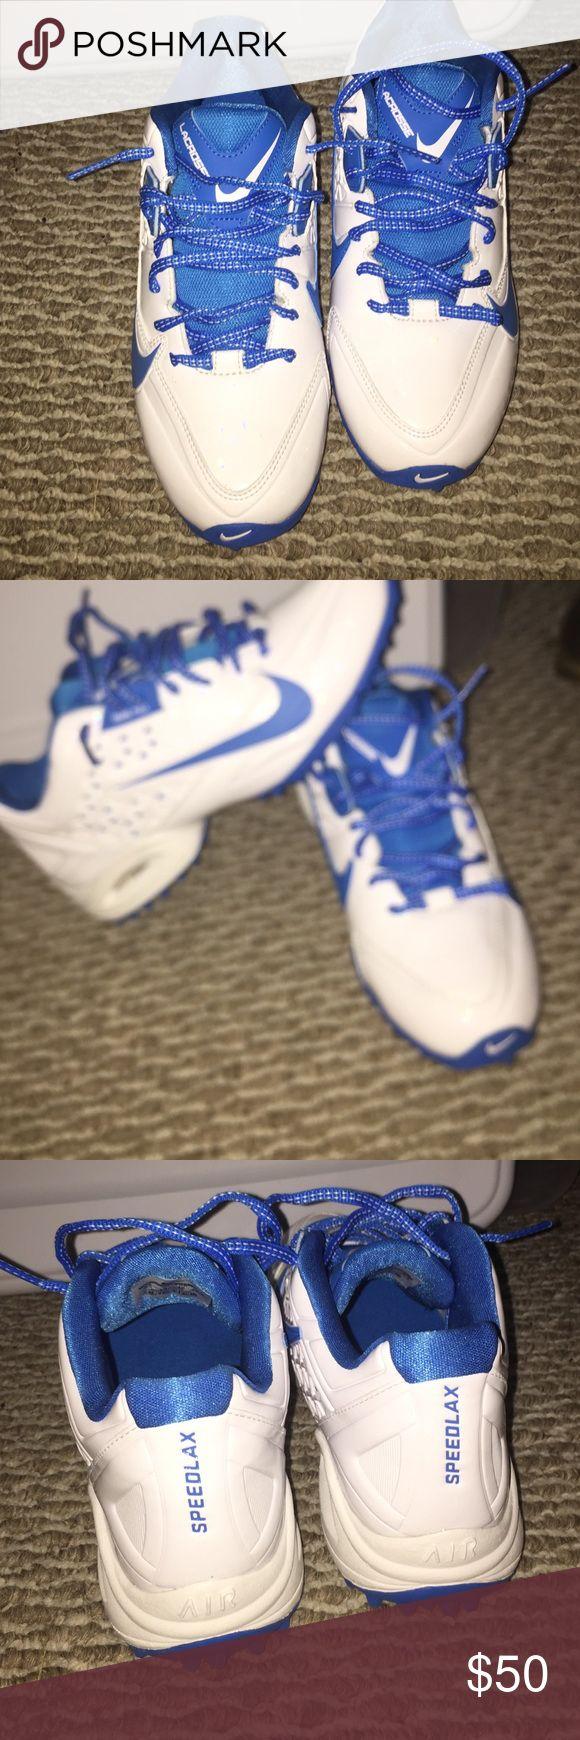 Nike turf shoes Never worn white and blue nike lacrosse turf shoes Nike Shoes Athletic Shoes